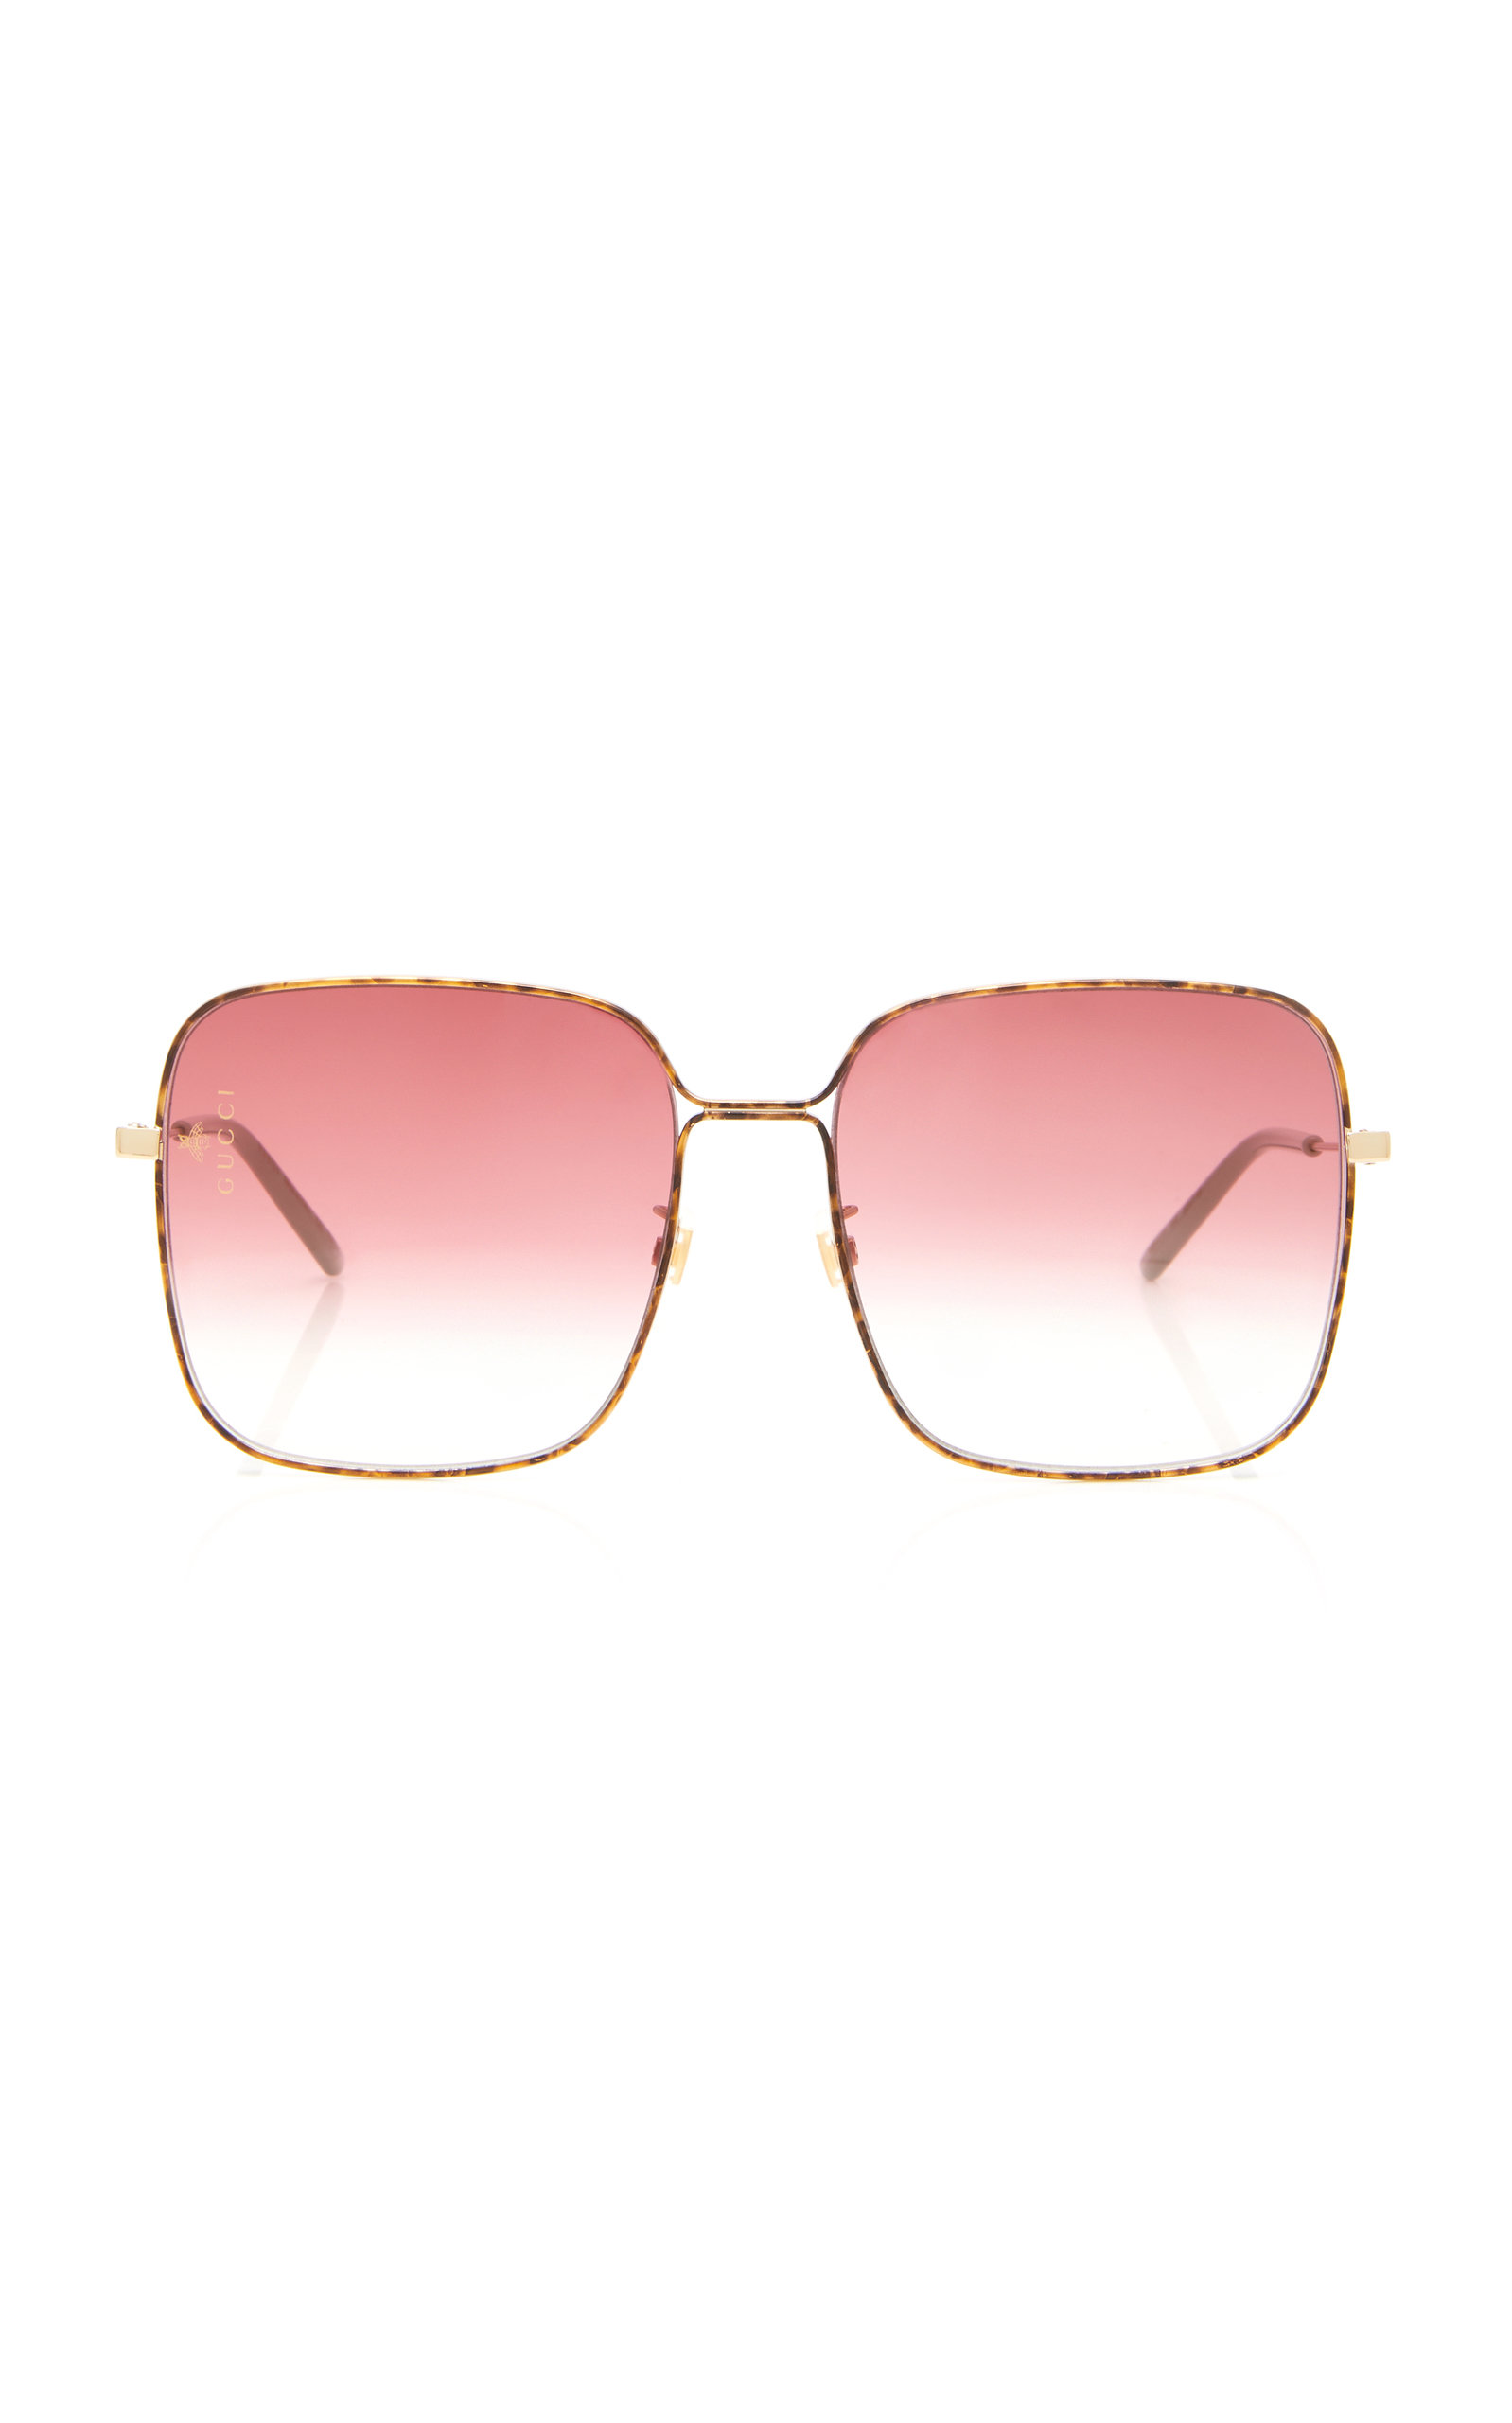 GUCCI | Gucci Sunglasses Light Glasant Oversized Metal Square-Frame Sunglasses | Goxip